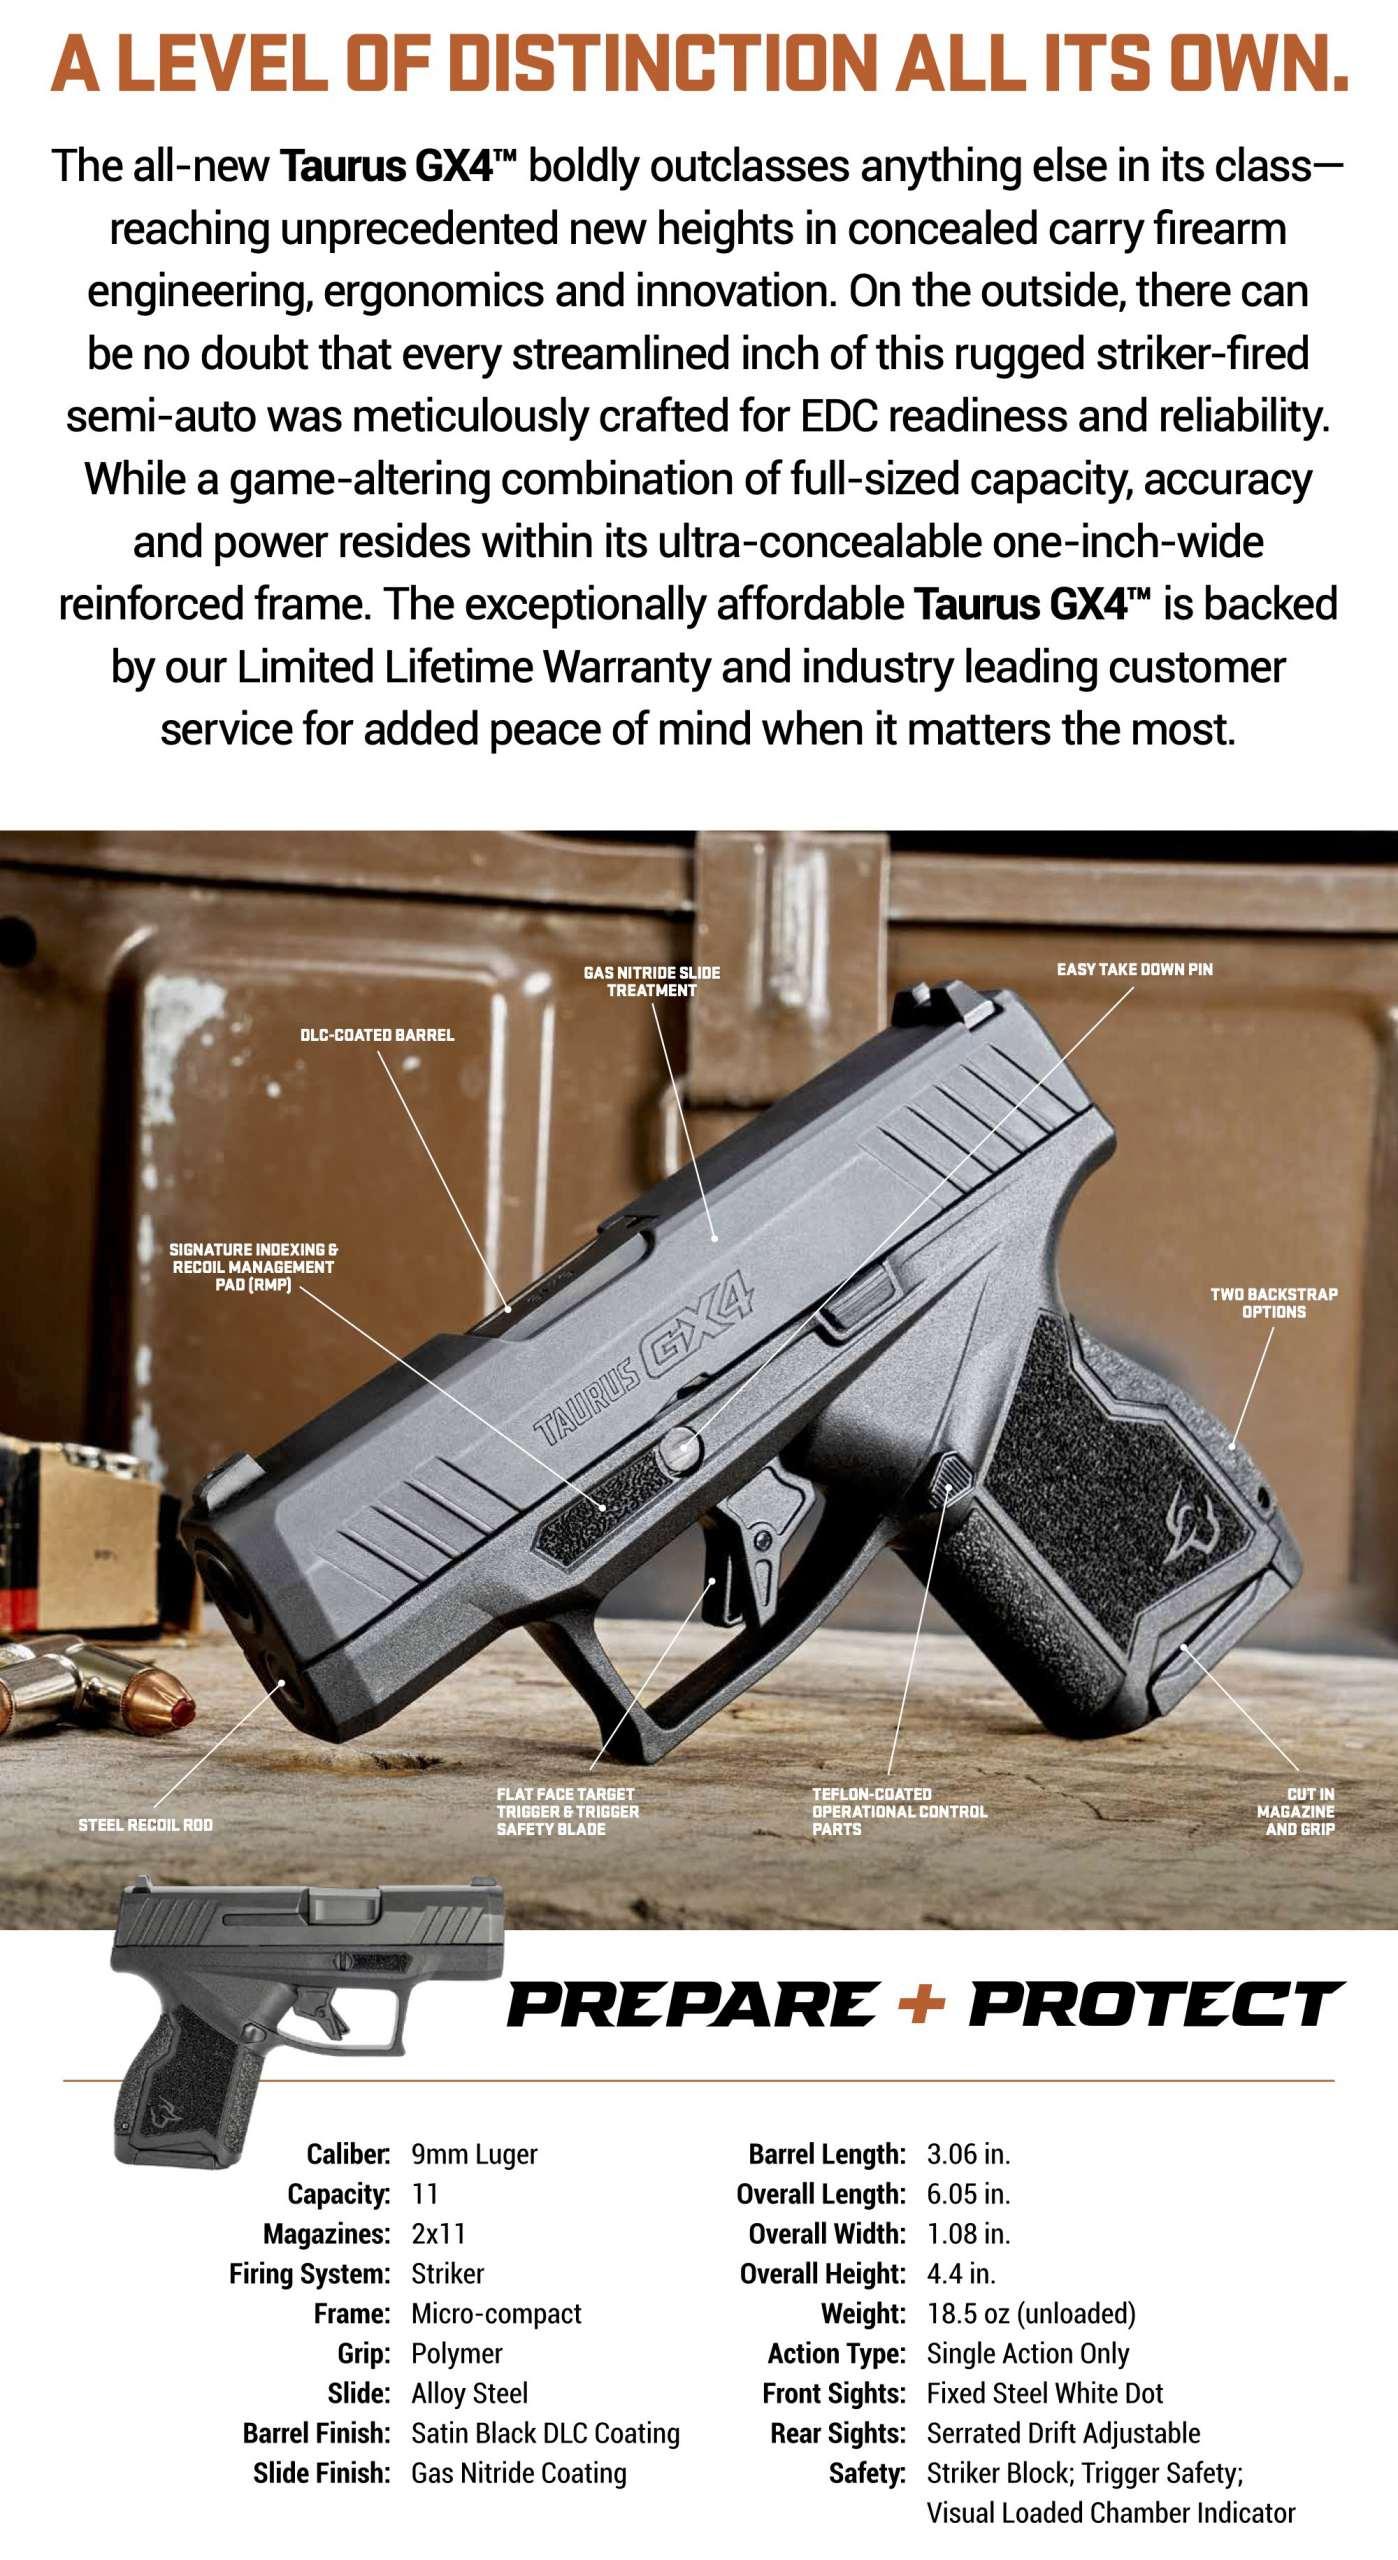 Taurus GX4 Giveaway Firearm Specs